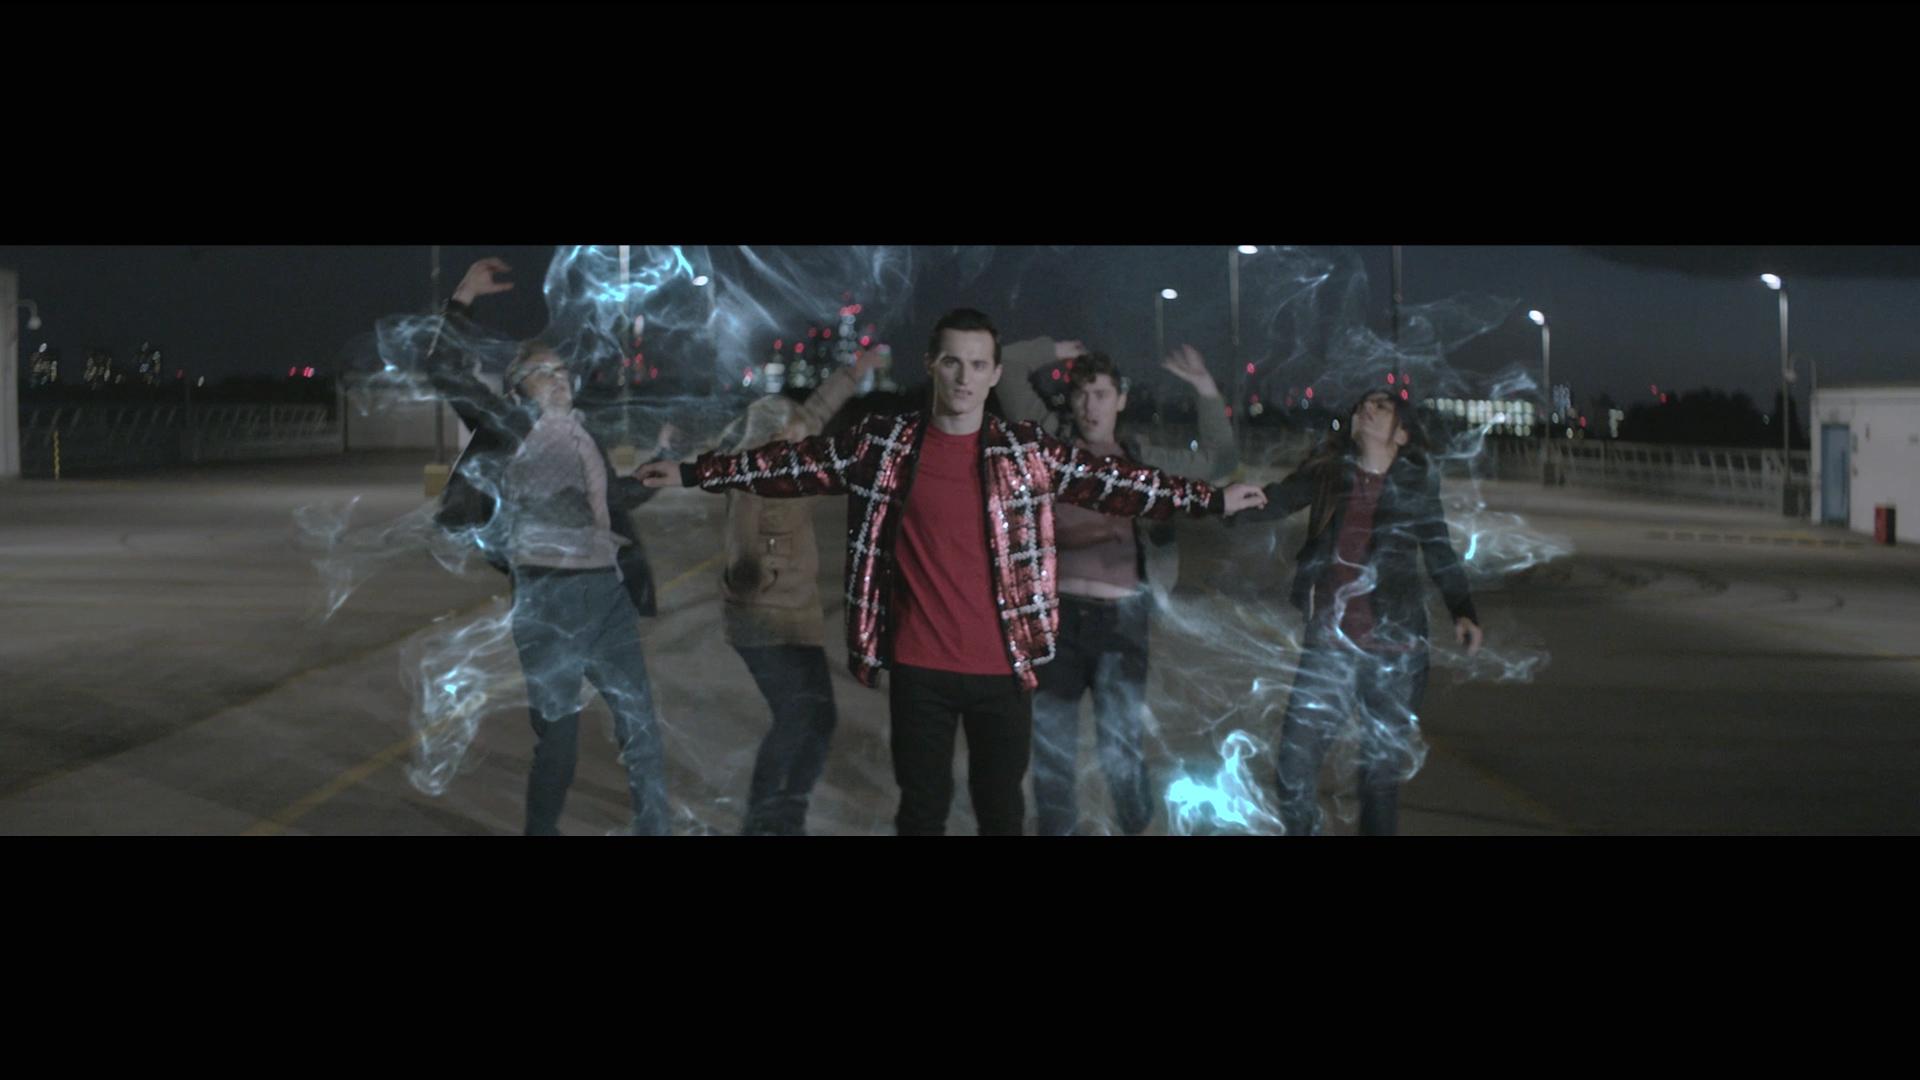 Dance Music Video